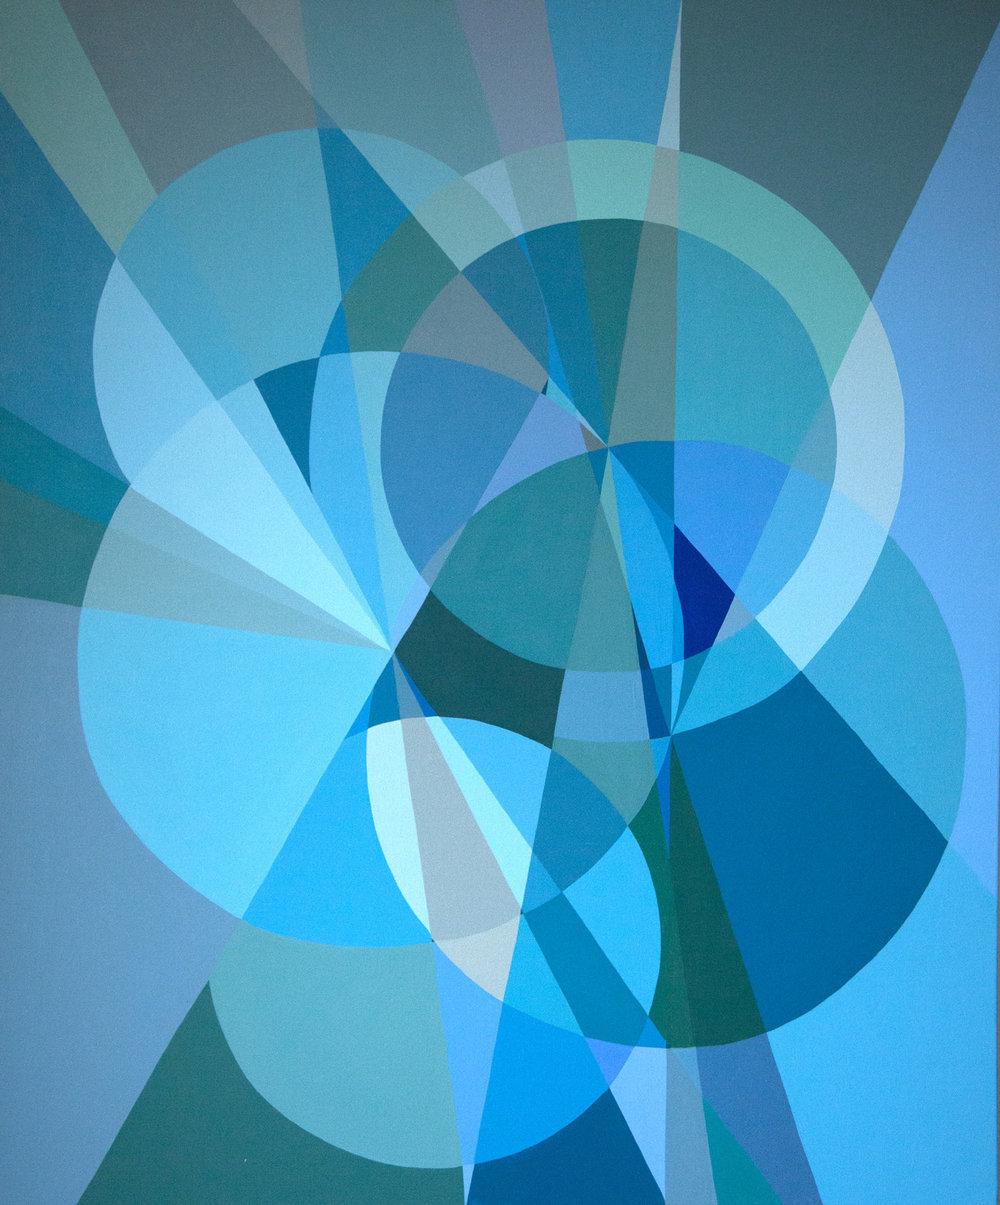 Blue Multiverse